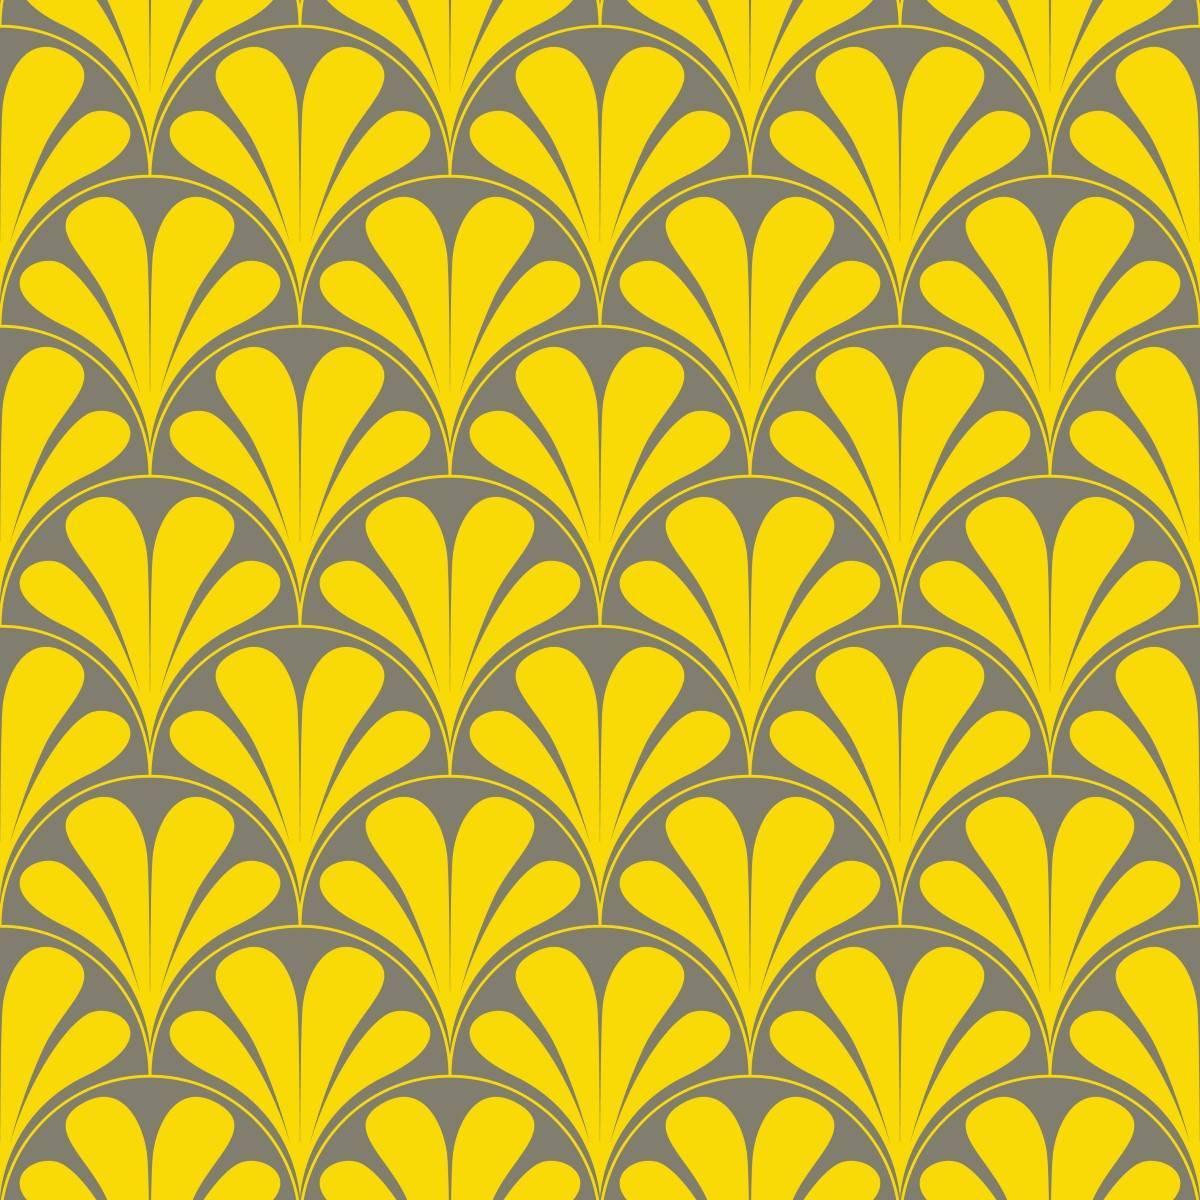 Papel de Parede Amarelo e Cinza Retrô | Adesivo Vinilico imagem 2